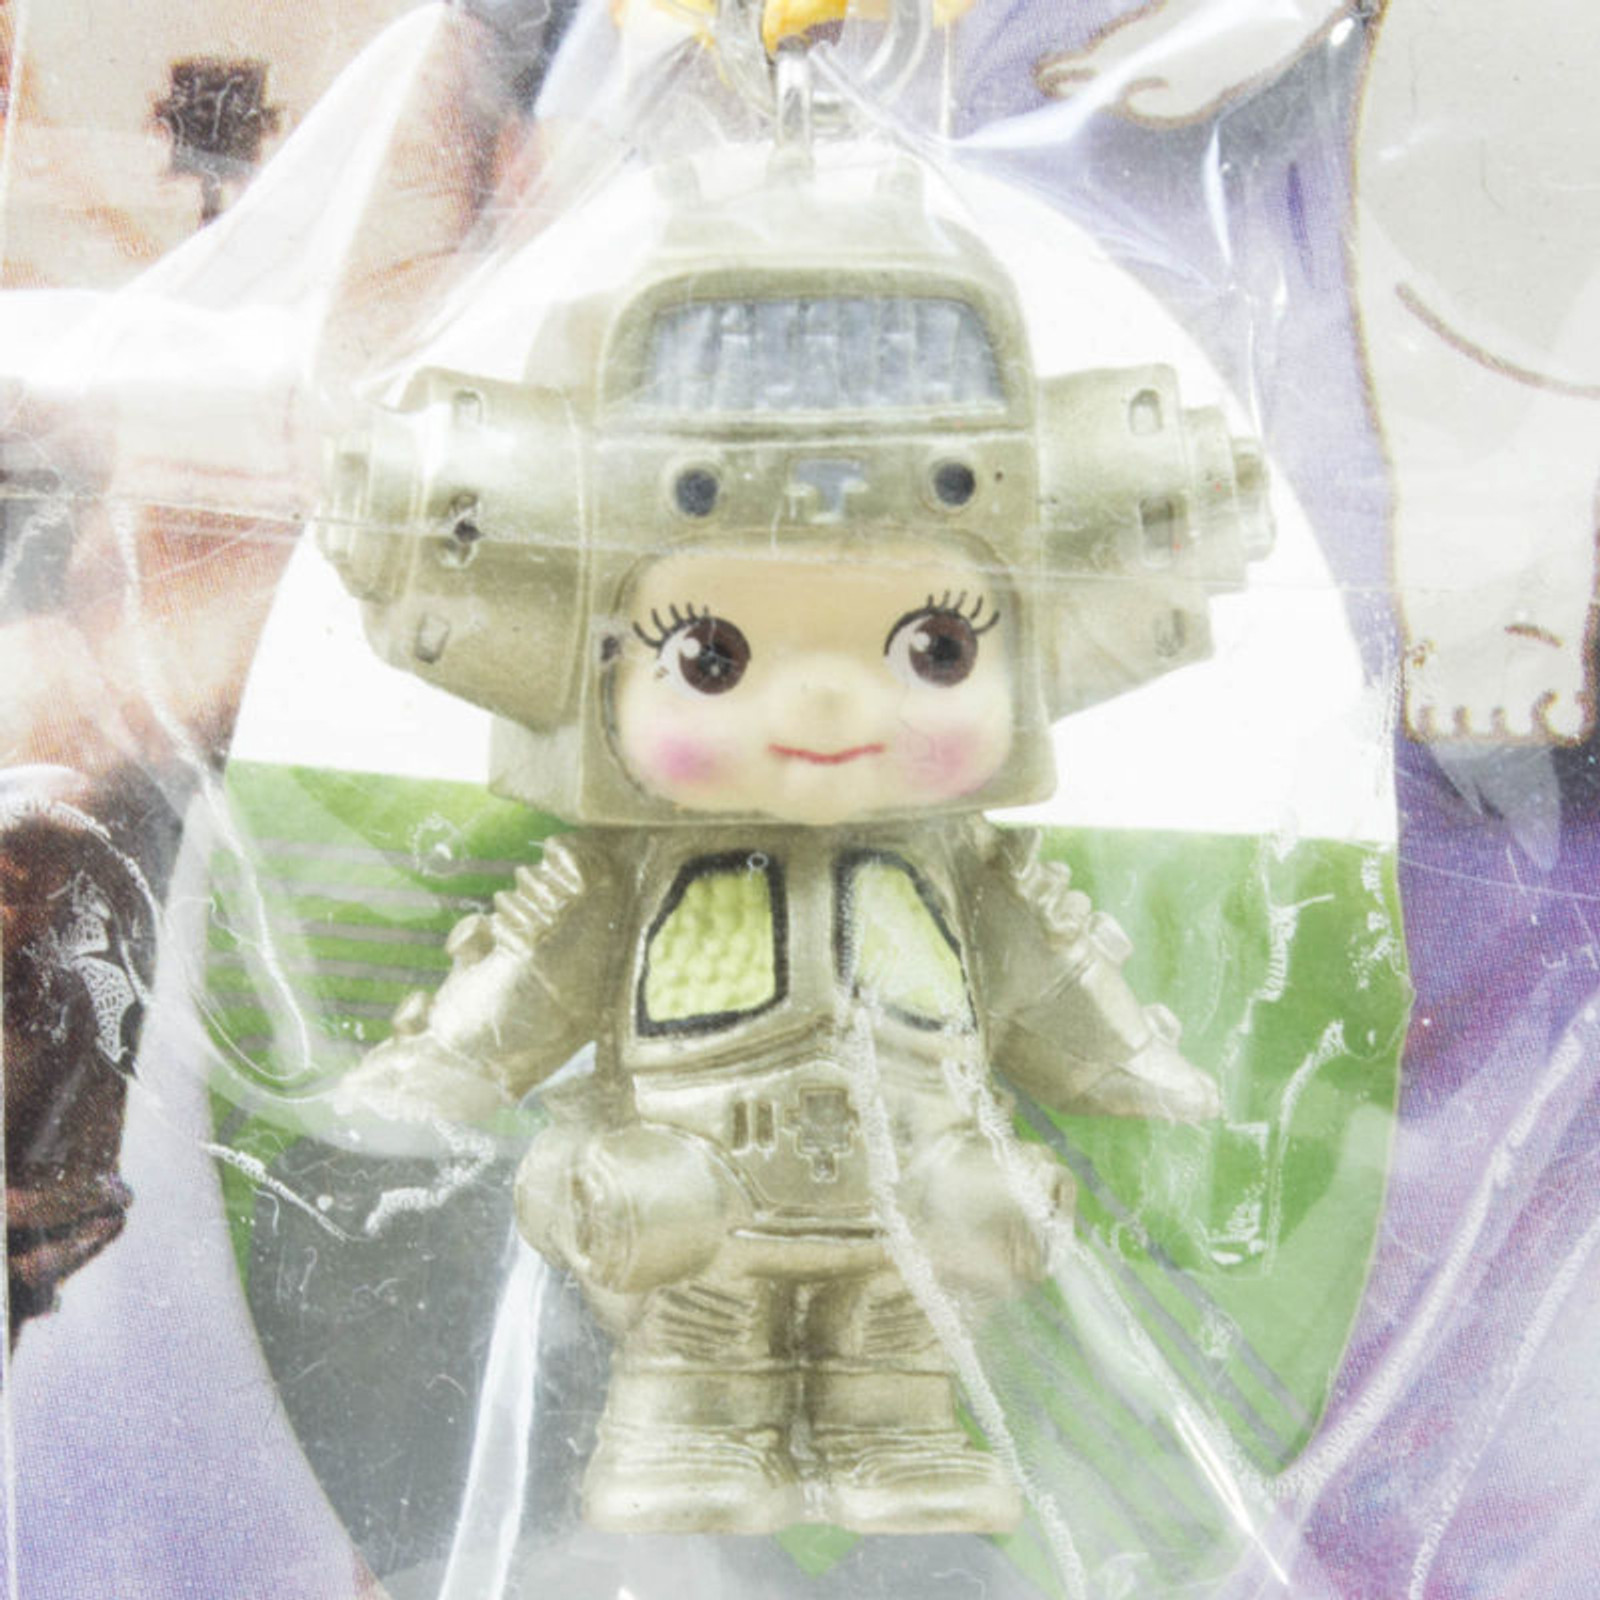 Ultraman King Joe Rose O'neill Kewpie Kewsion Figure Strap JAPAN ANIME